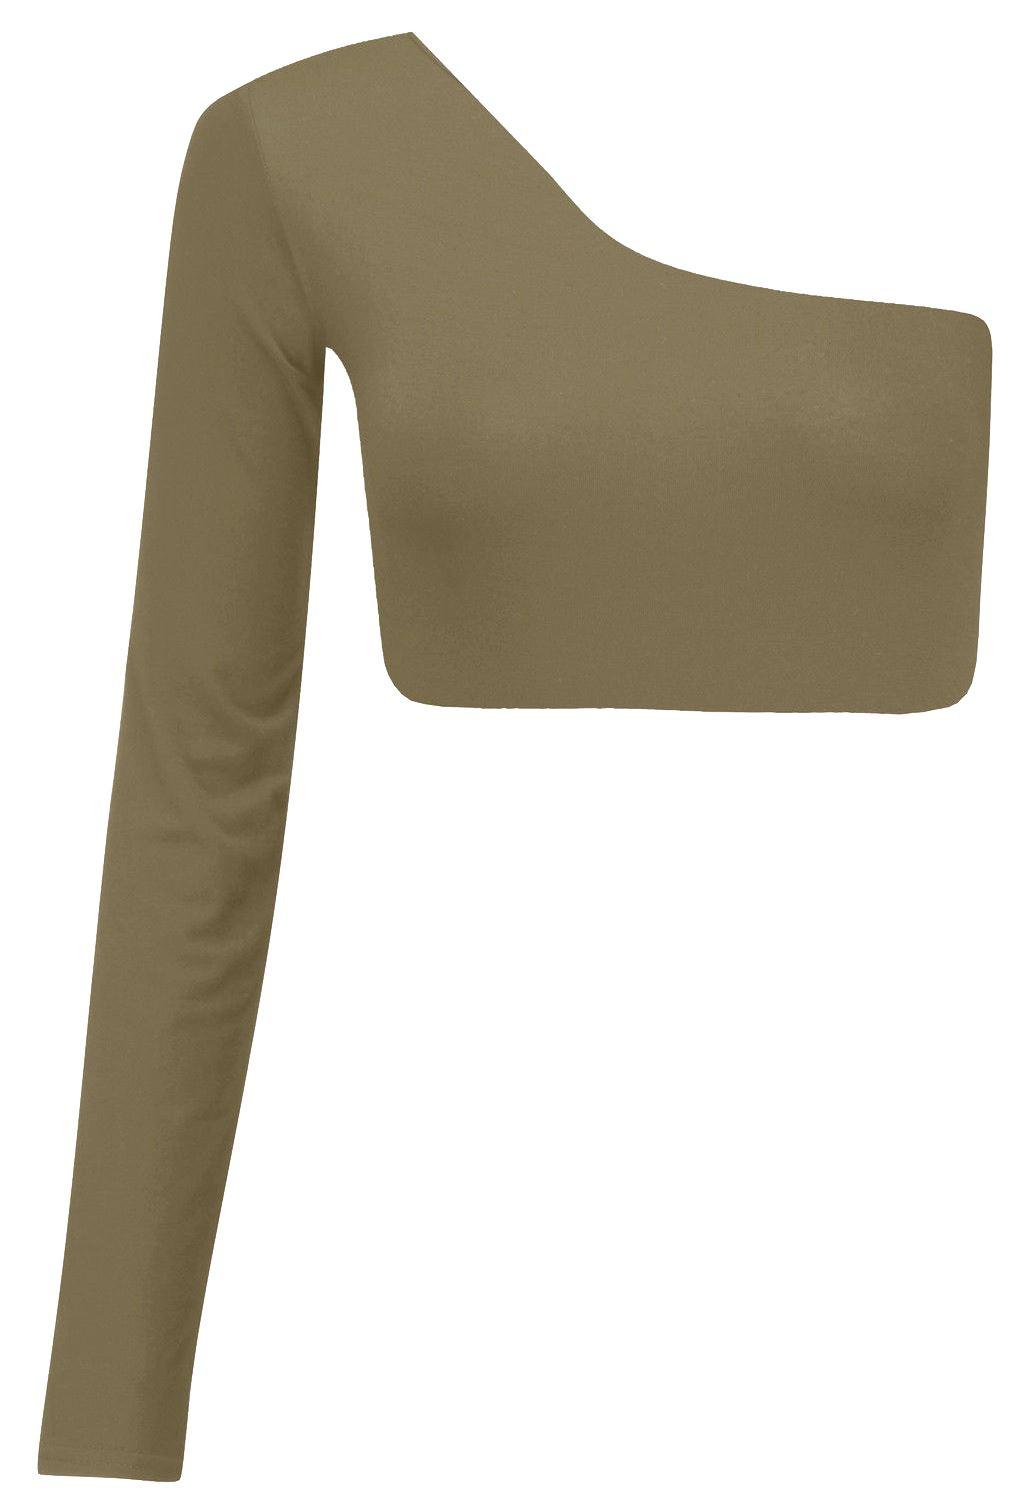 neu damen einschultrig kurzes top mit langen rmeln bustier top 8 14 ebay. Black Bedroom Furniture Sets. Home Design Ideas